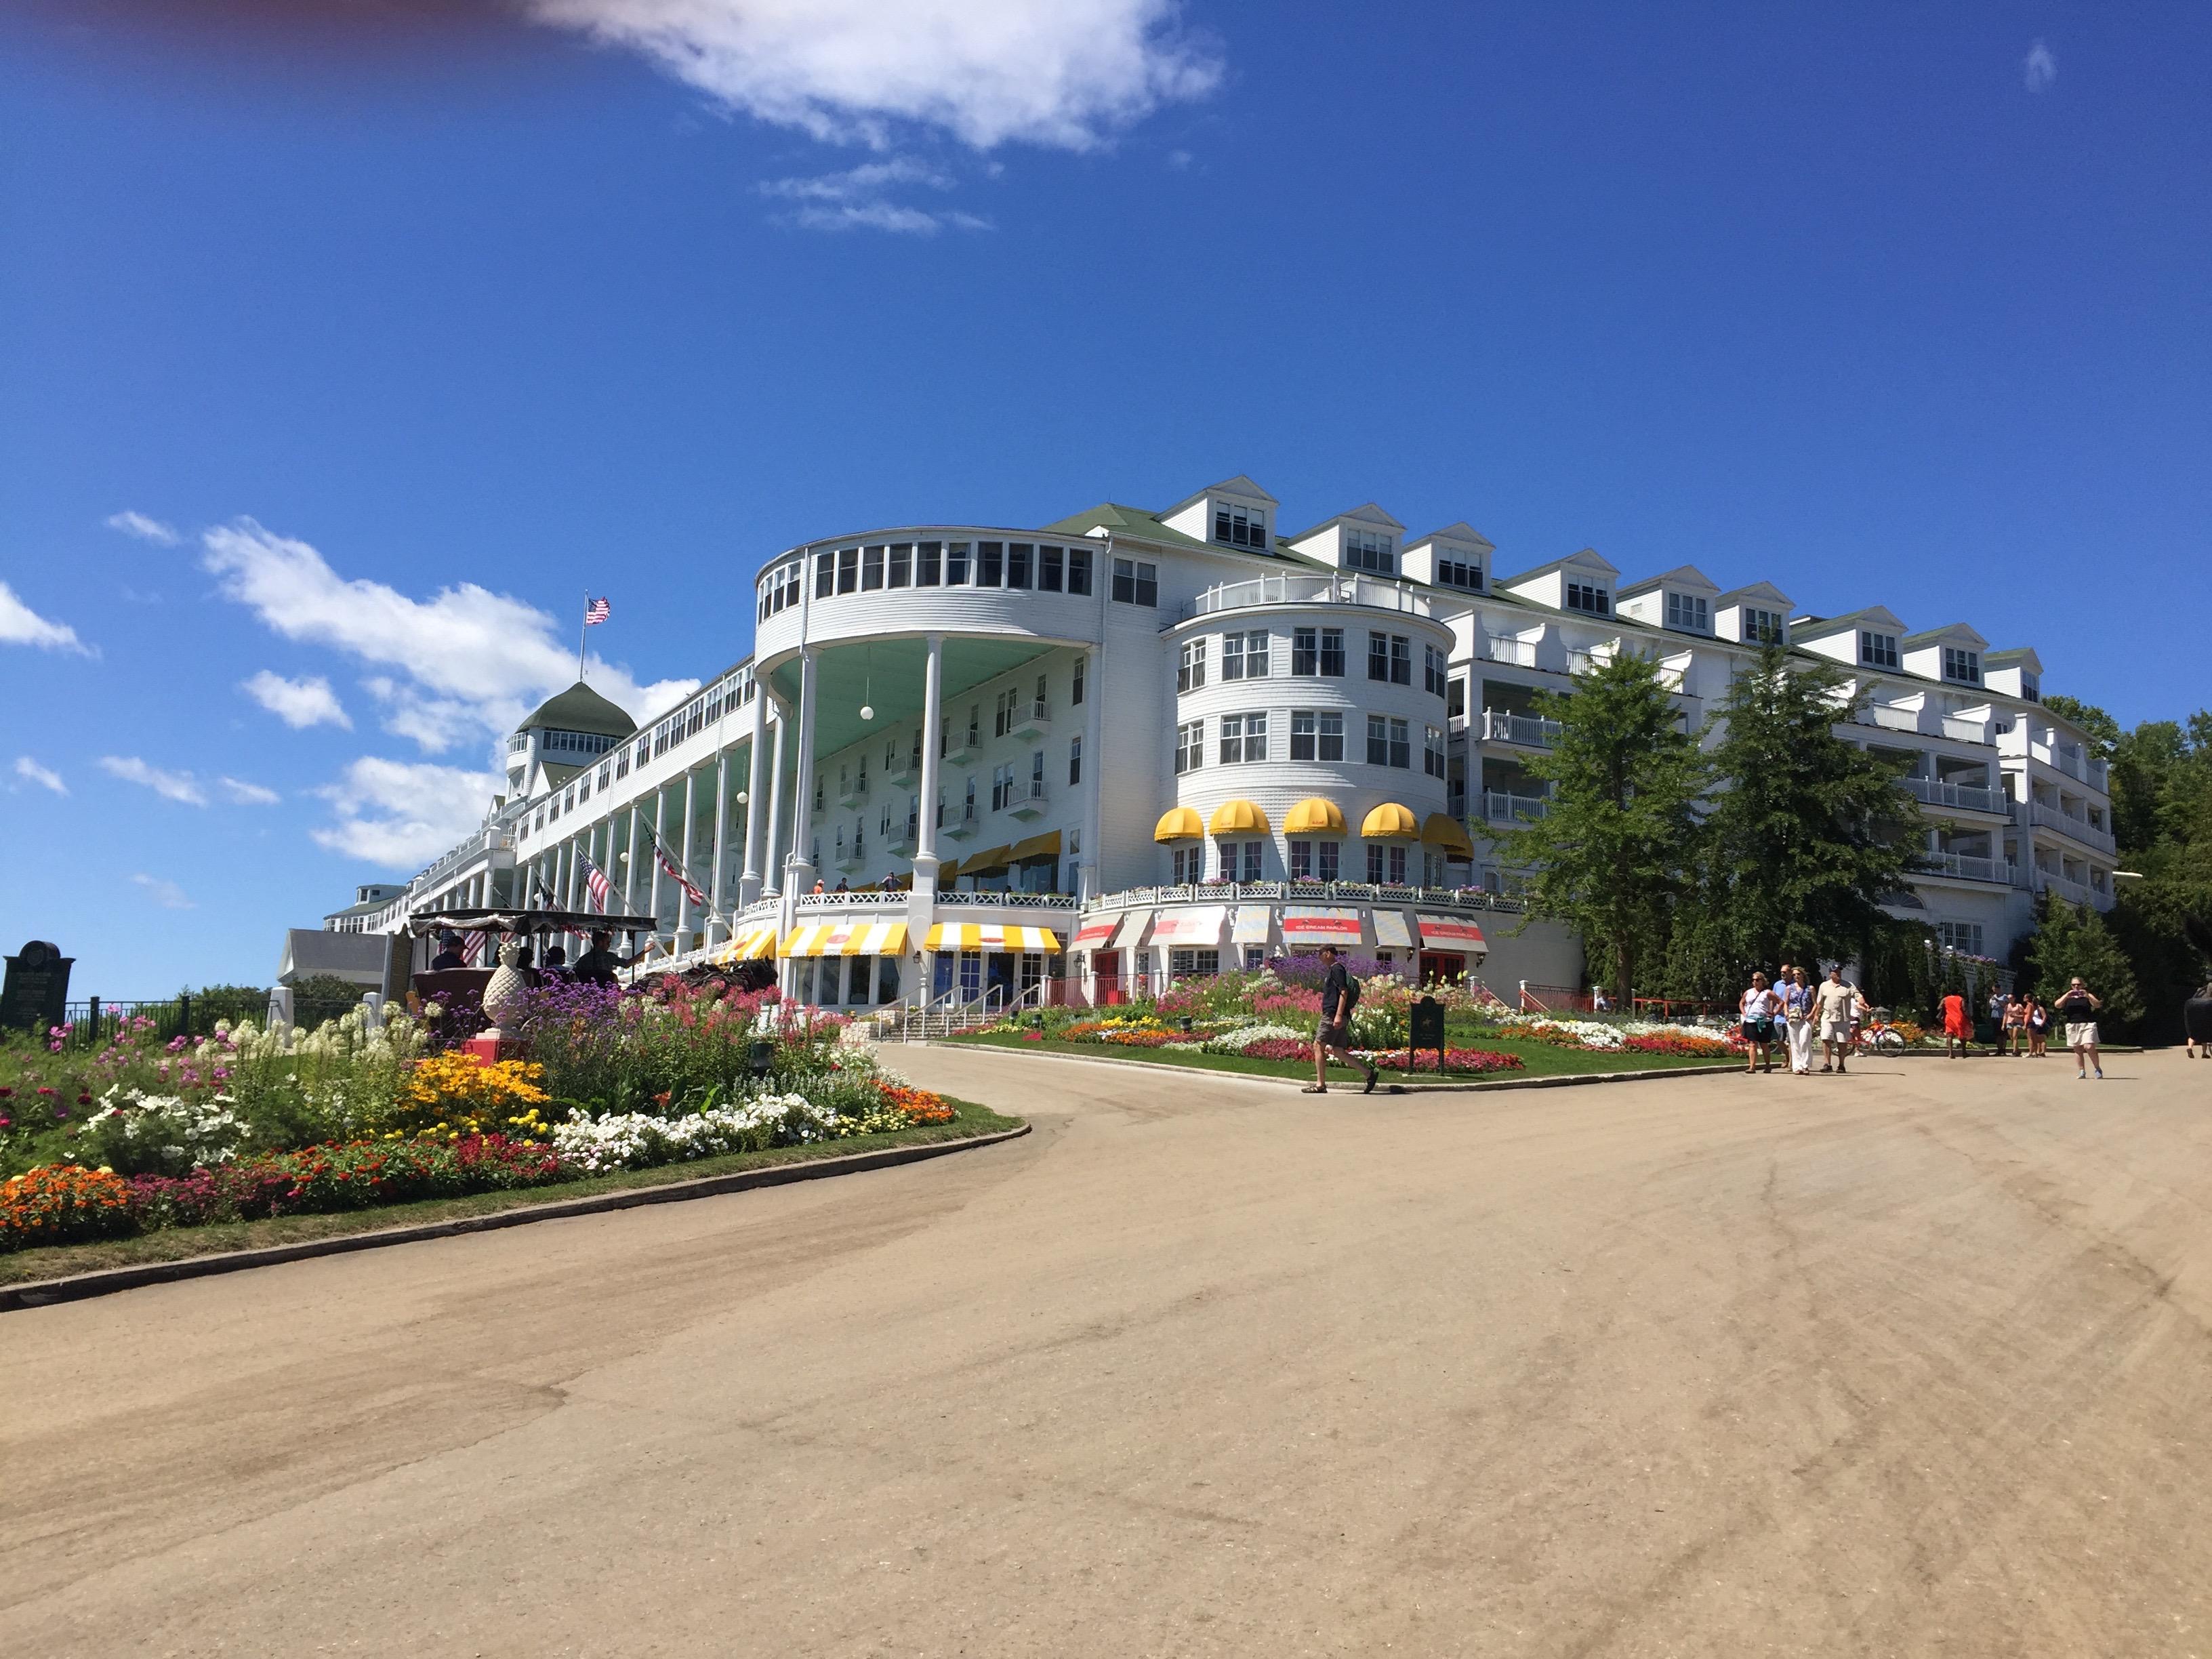 Destination Grand The Grand Hotel Mackinac Island Wanderlust Travel Press And Tours